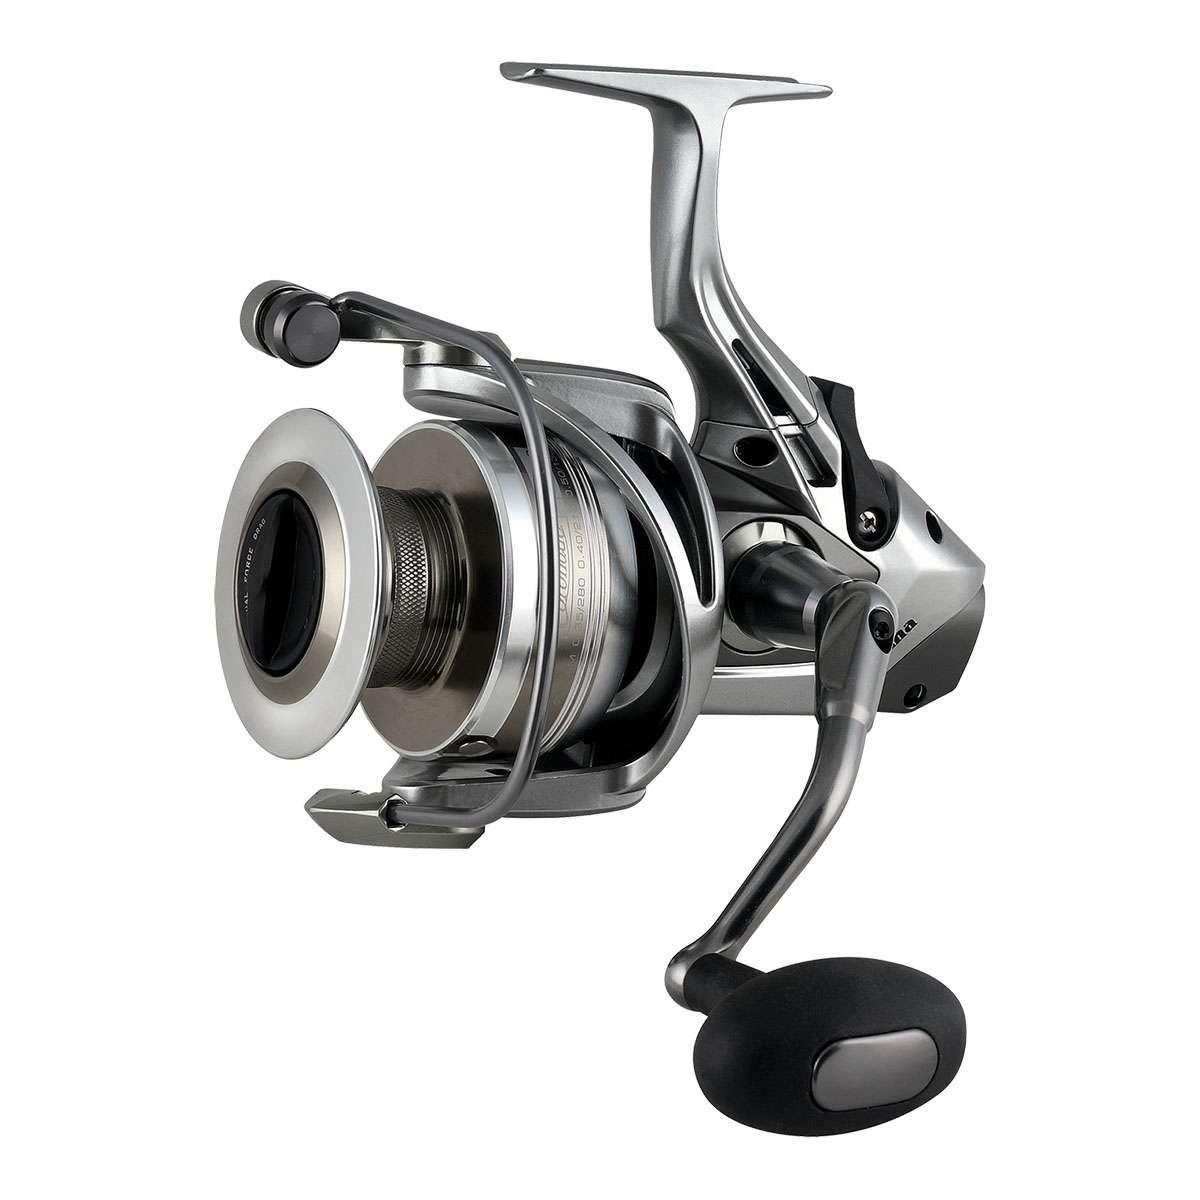 Okuma cdx 65 coronado baitfeeder spinning reel tackledirect for Okuma fishing reels